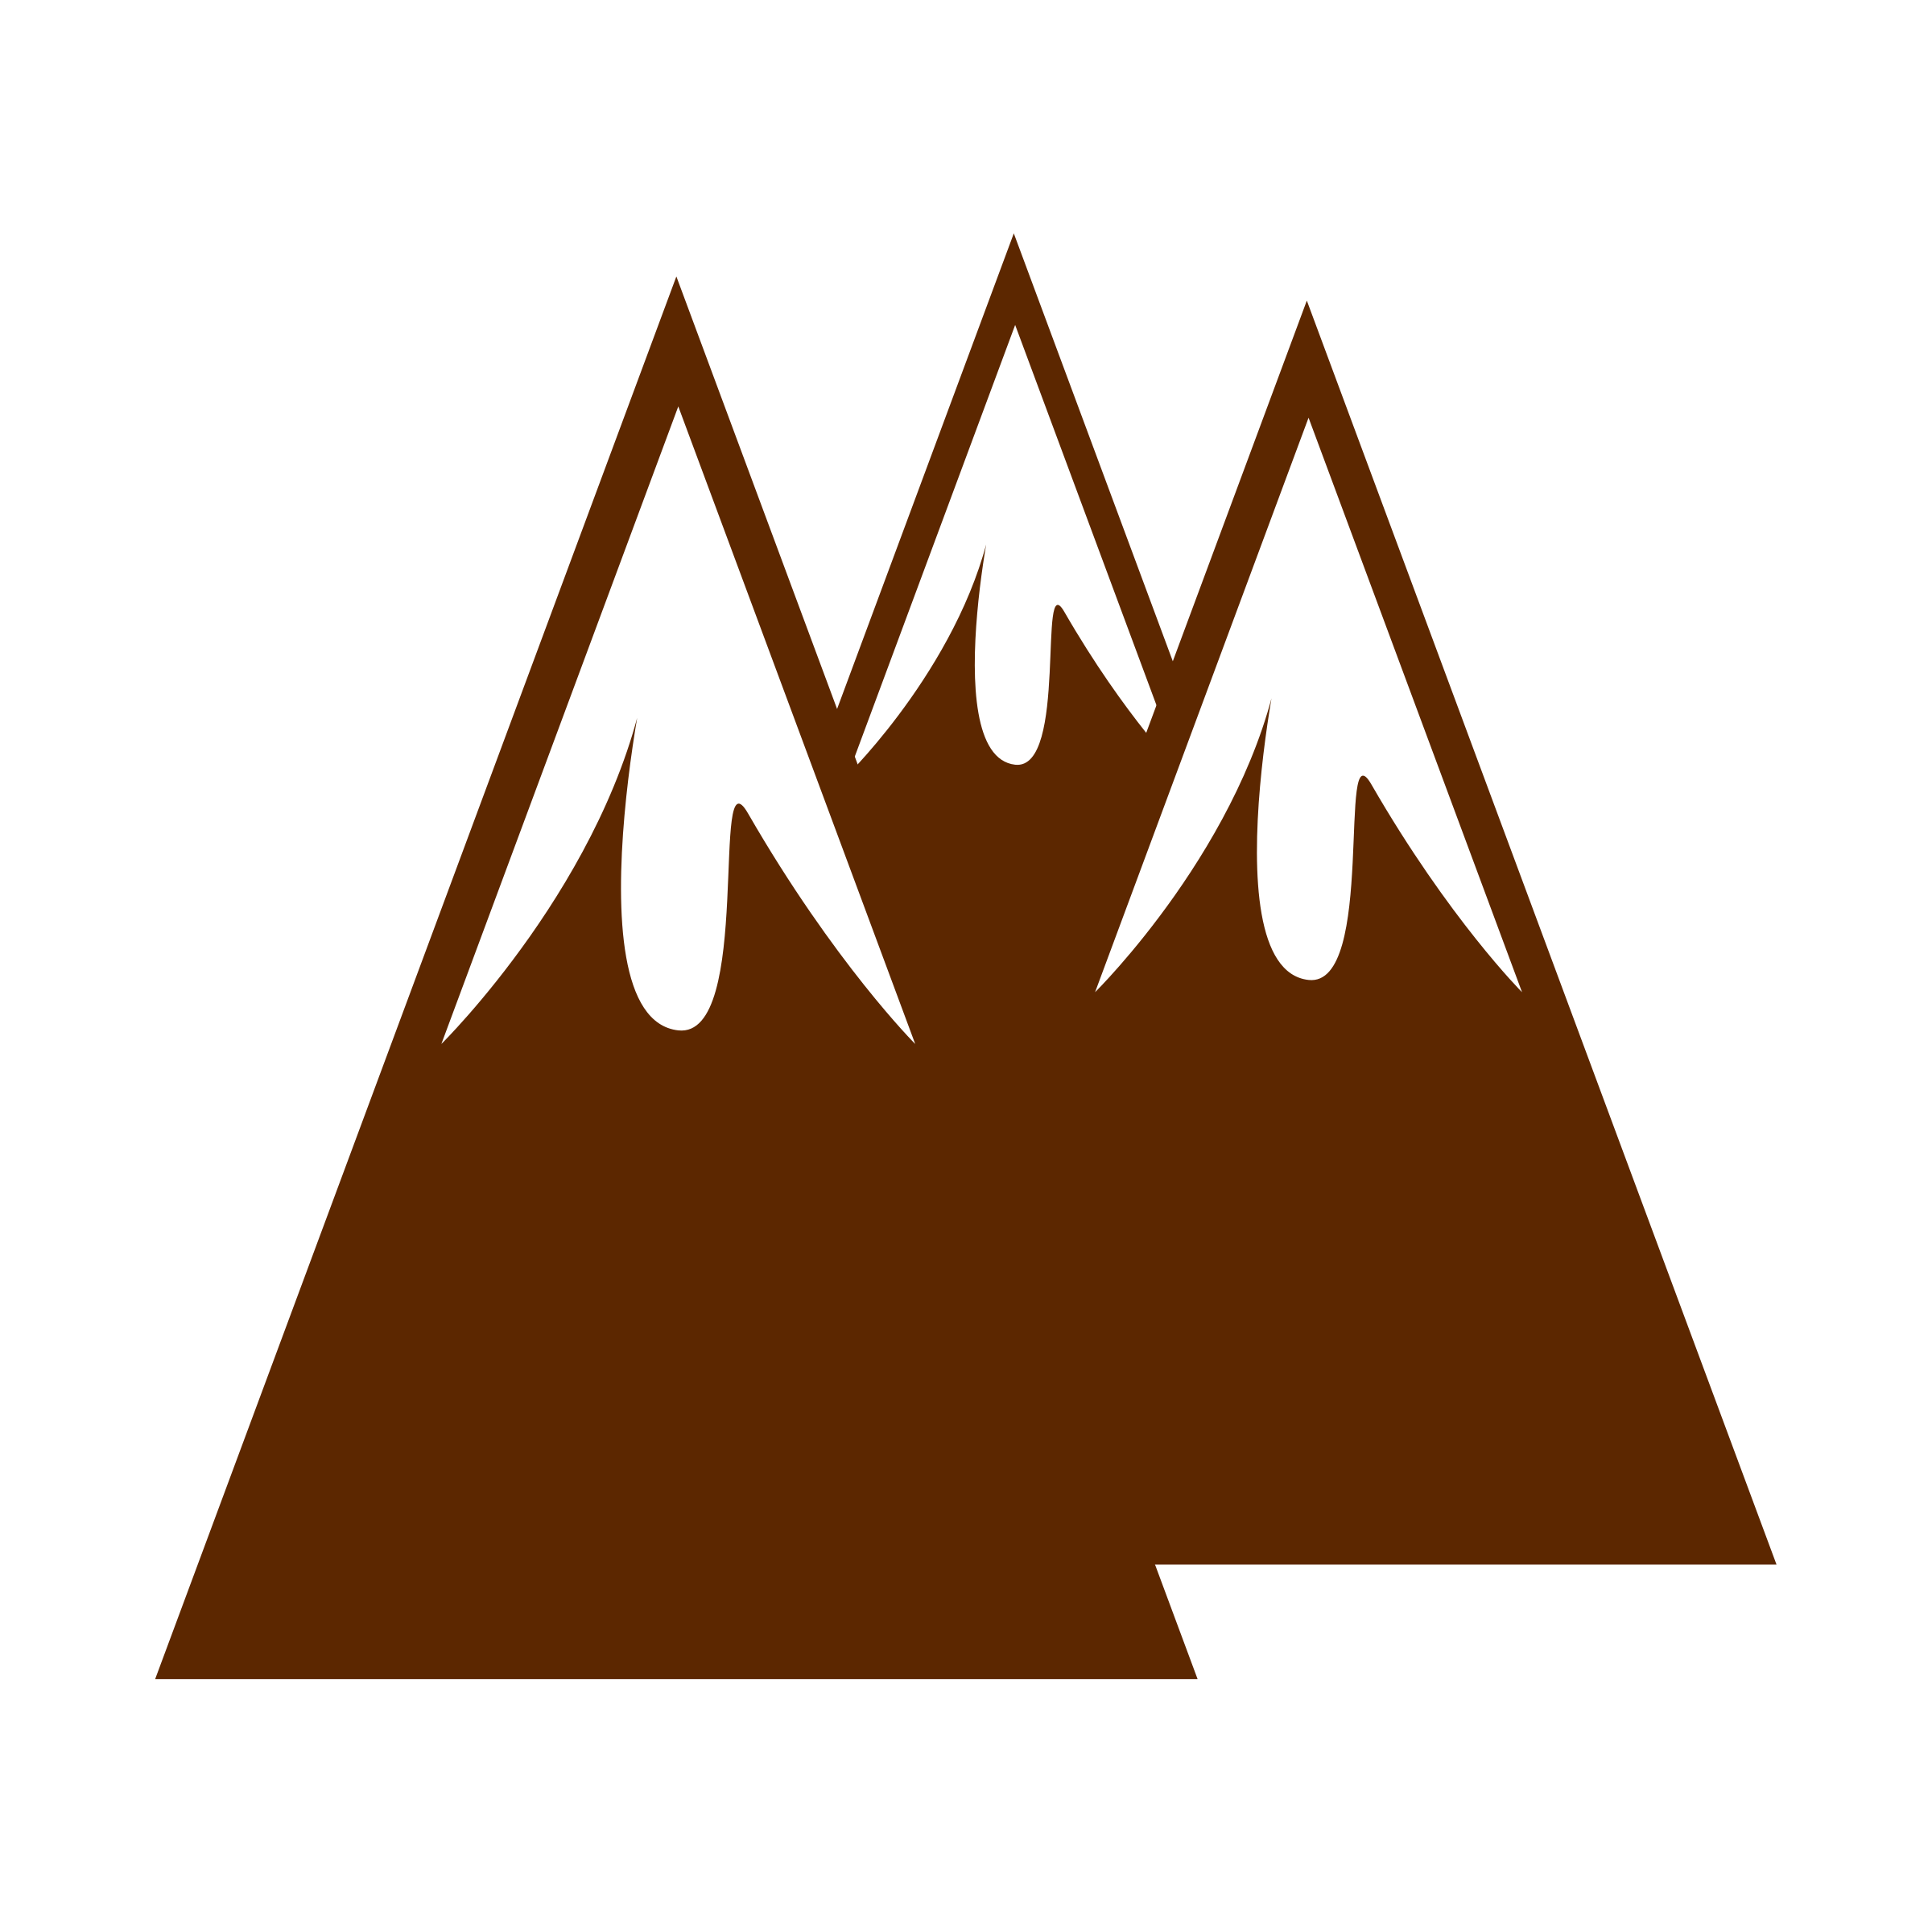 Mountains big image png. Logo clipart mountain